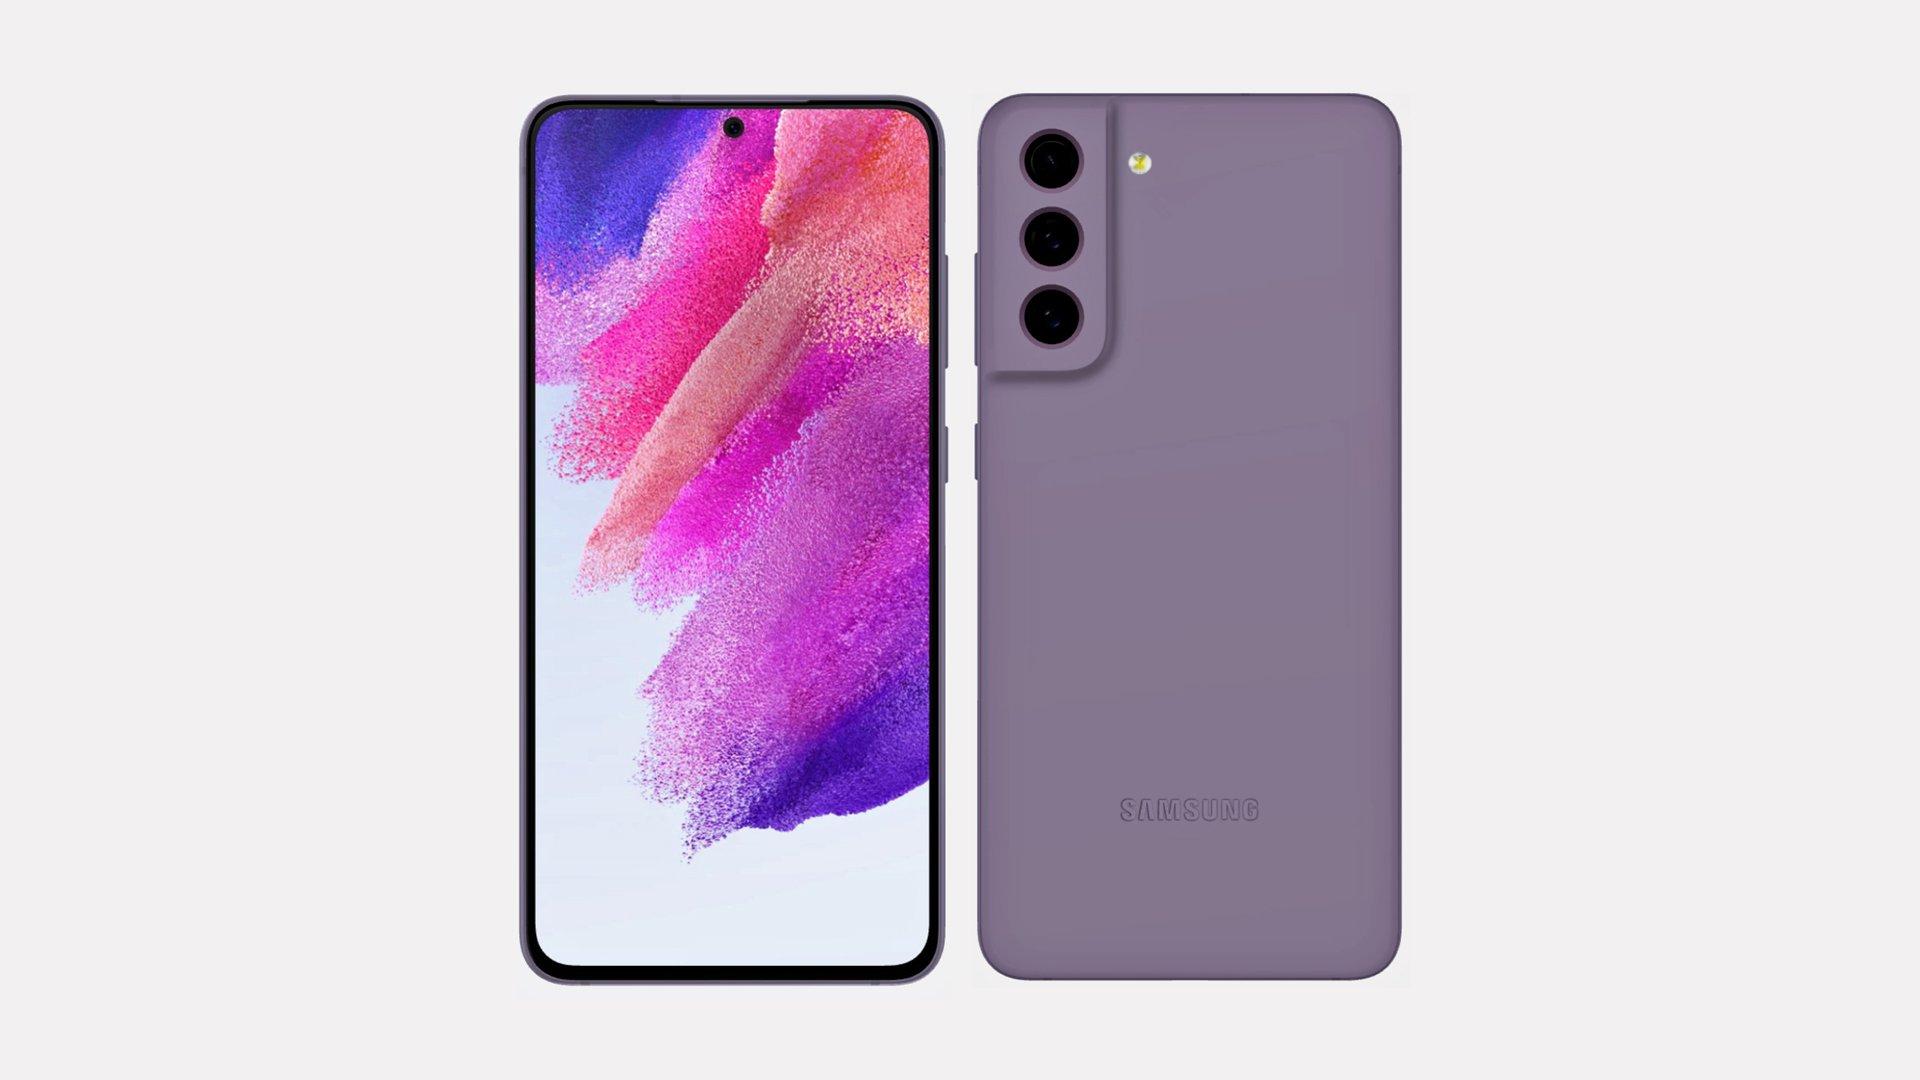 Samsung Galaxy S21 FE Lilac Purple